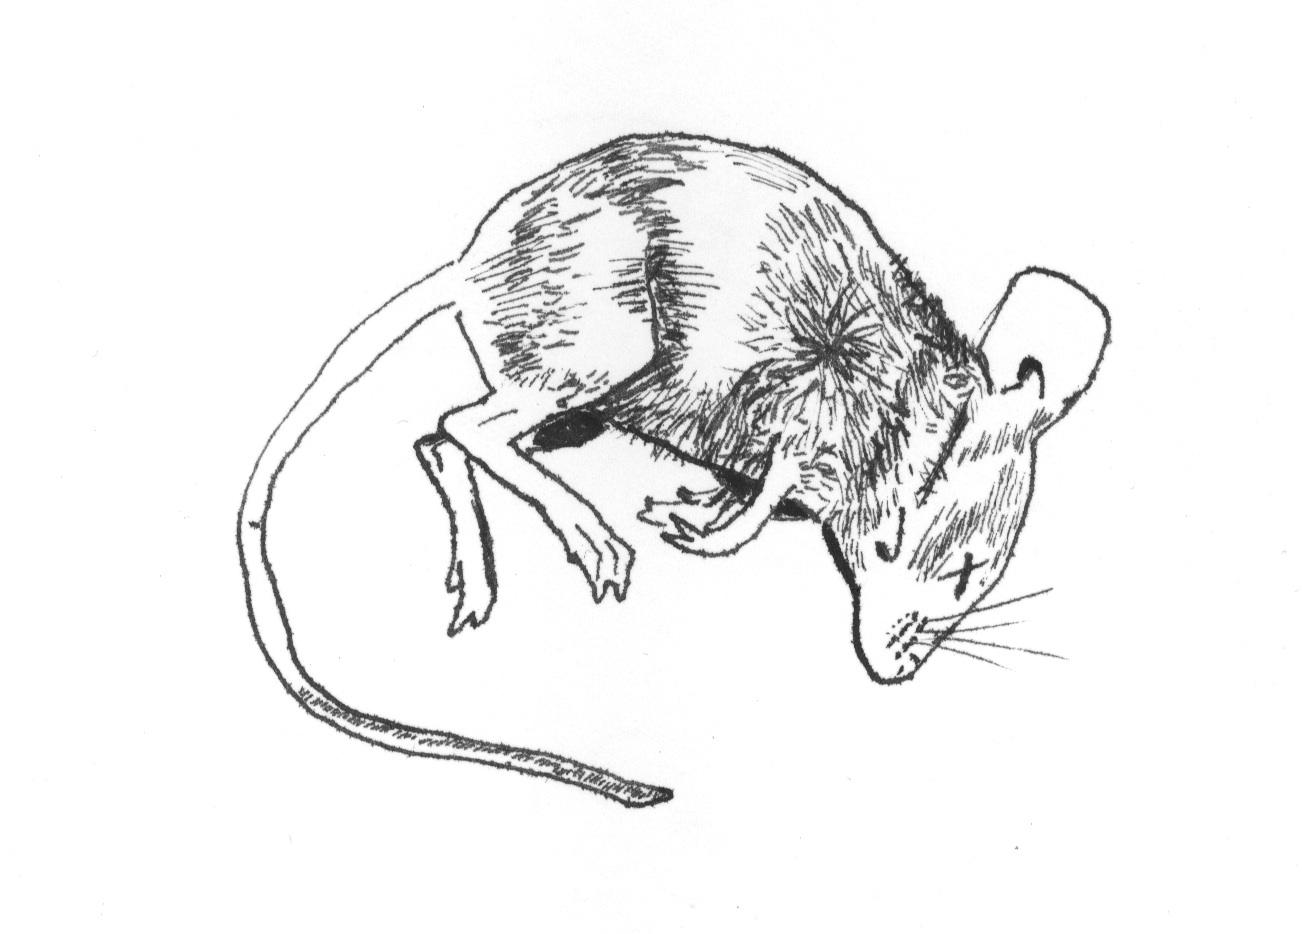 Dead Mouse Hilary Schenker